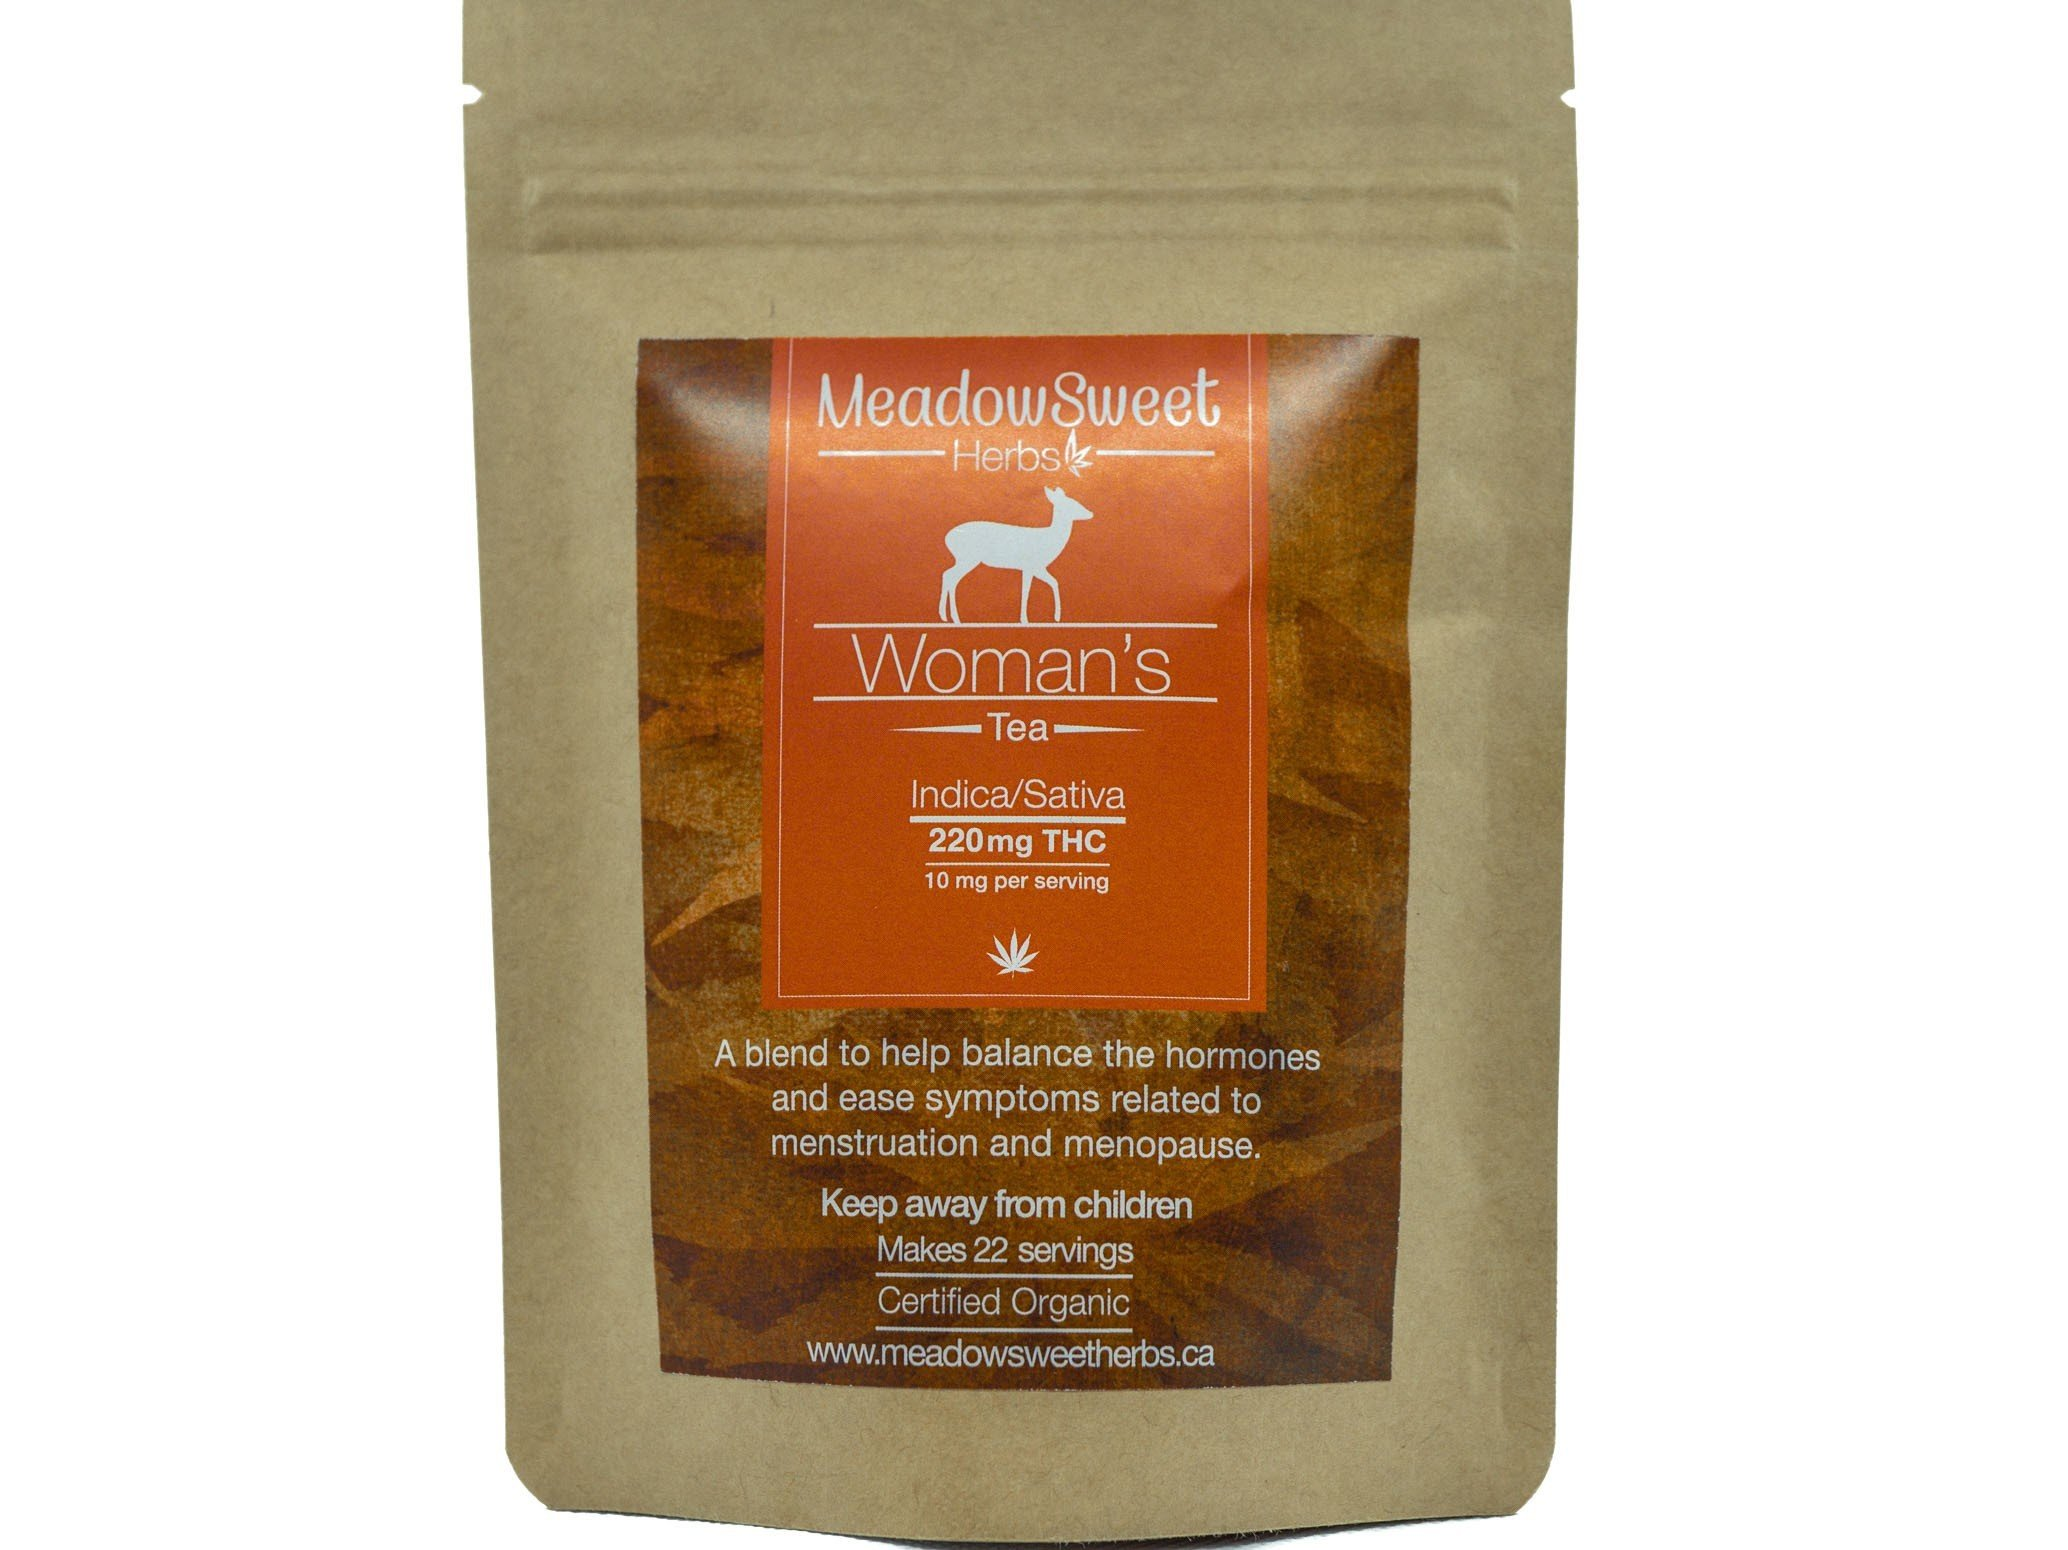 Women's Tea by MeadowSweet Herbs (220mg THC) 01149